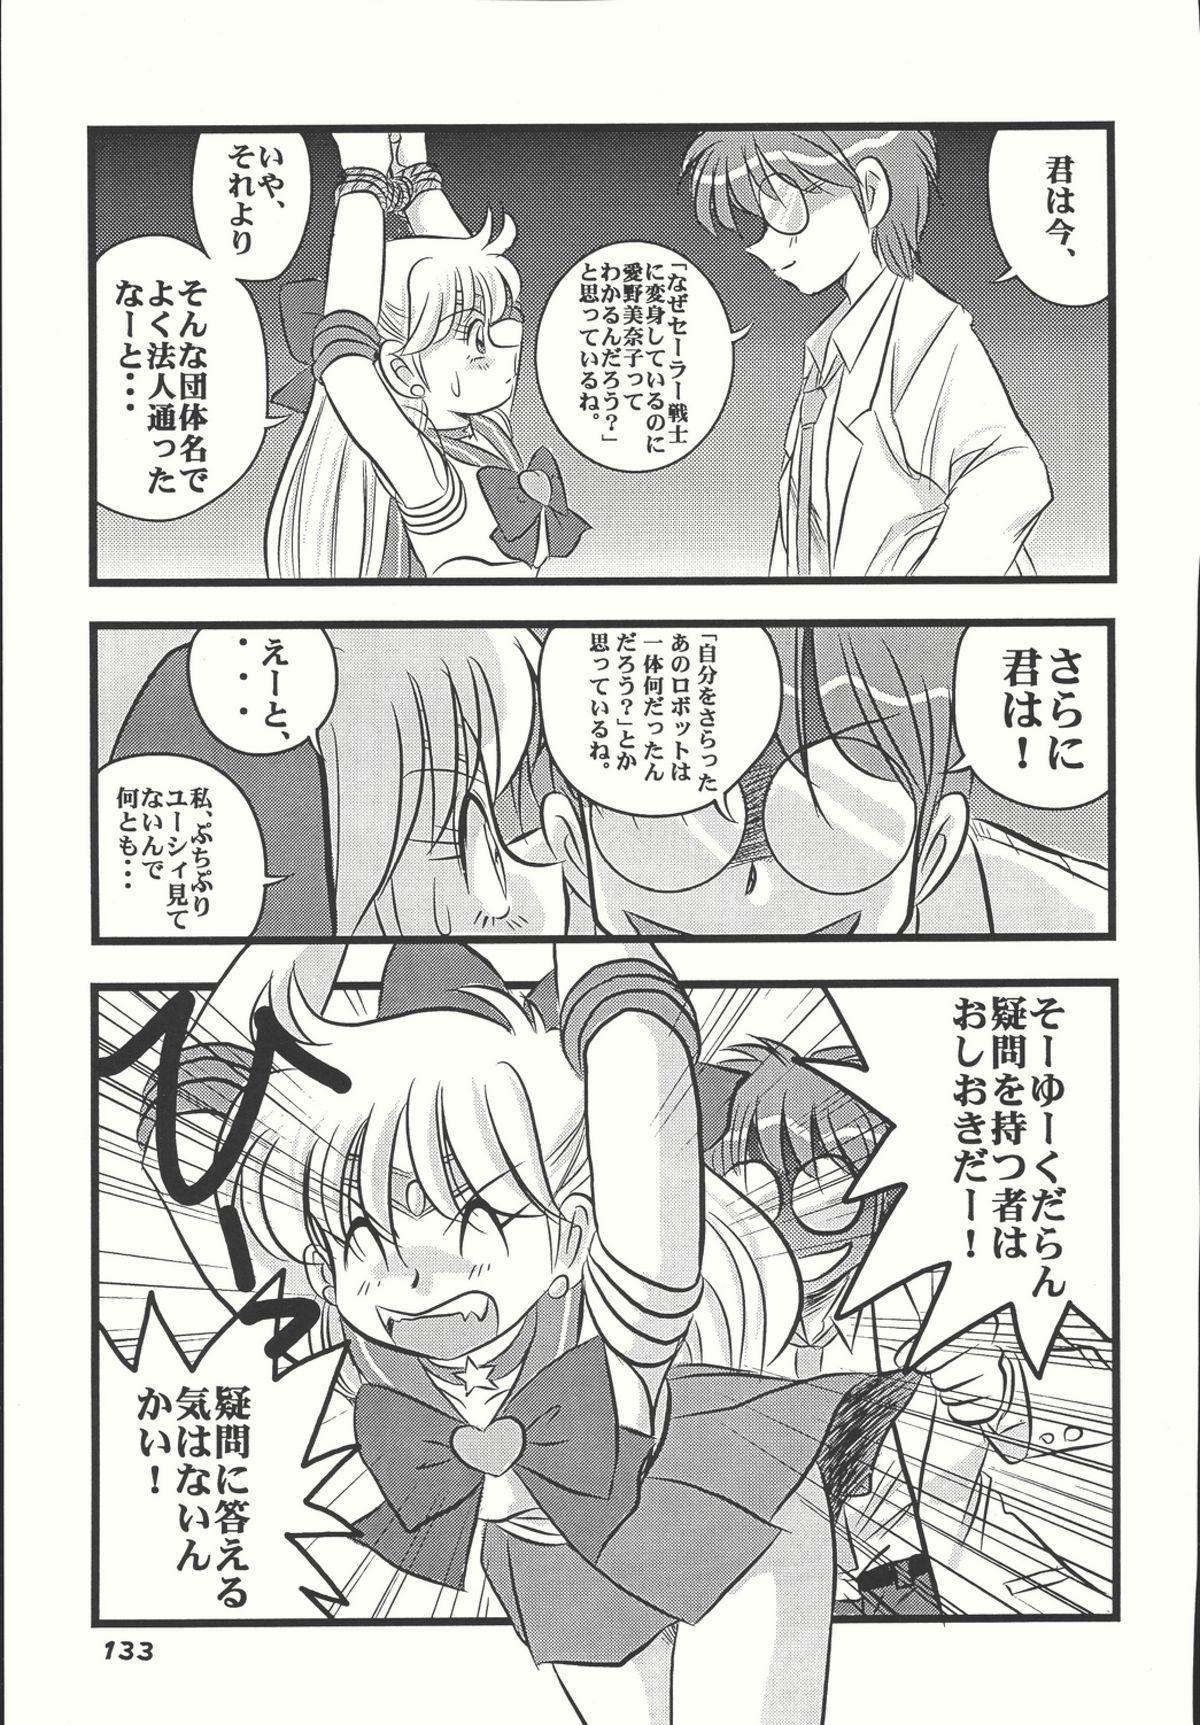 Sailor Spirits Super 131